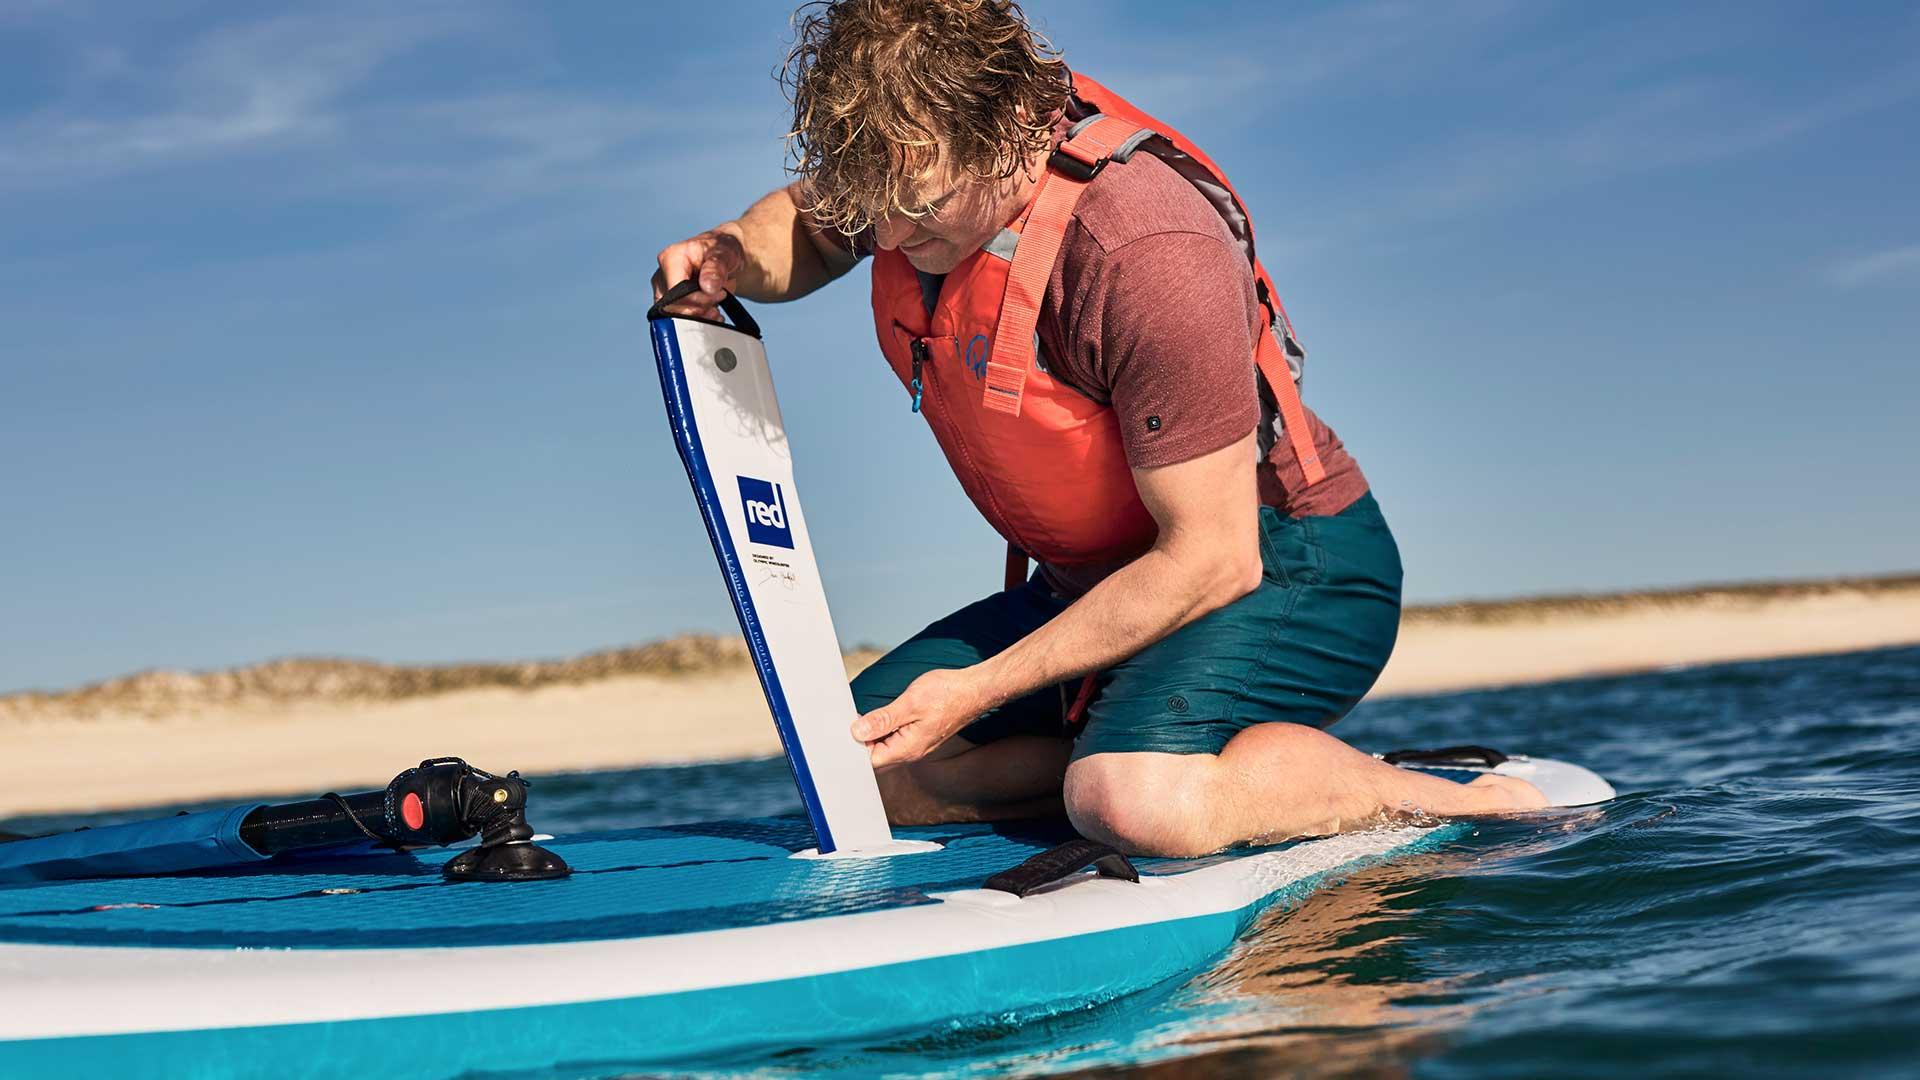 redpaddleco-107-windsurf-inflatable-paddle-board-desktop-gallery-fins